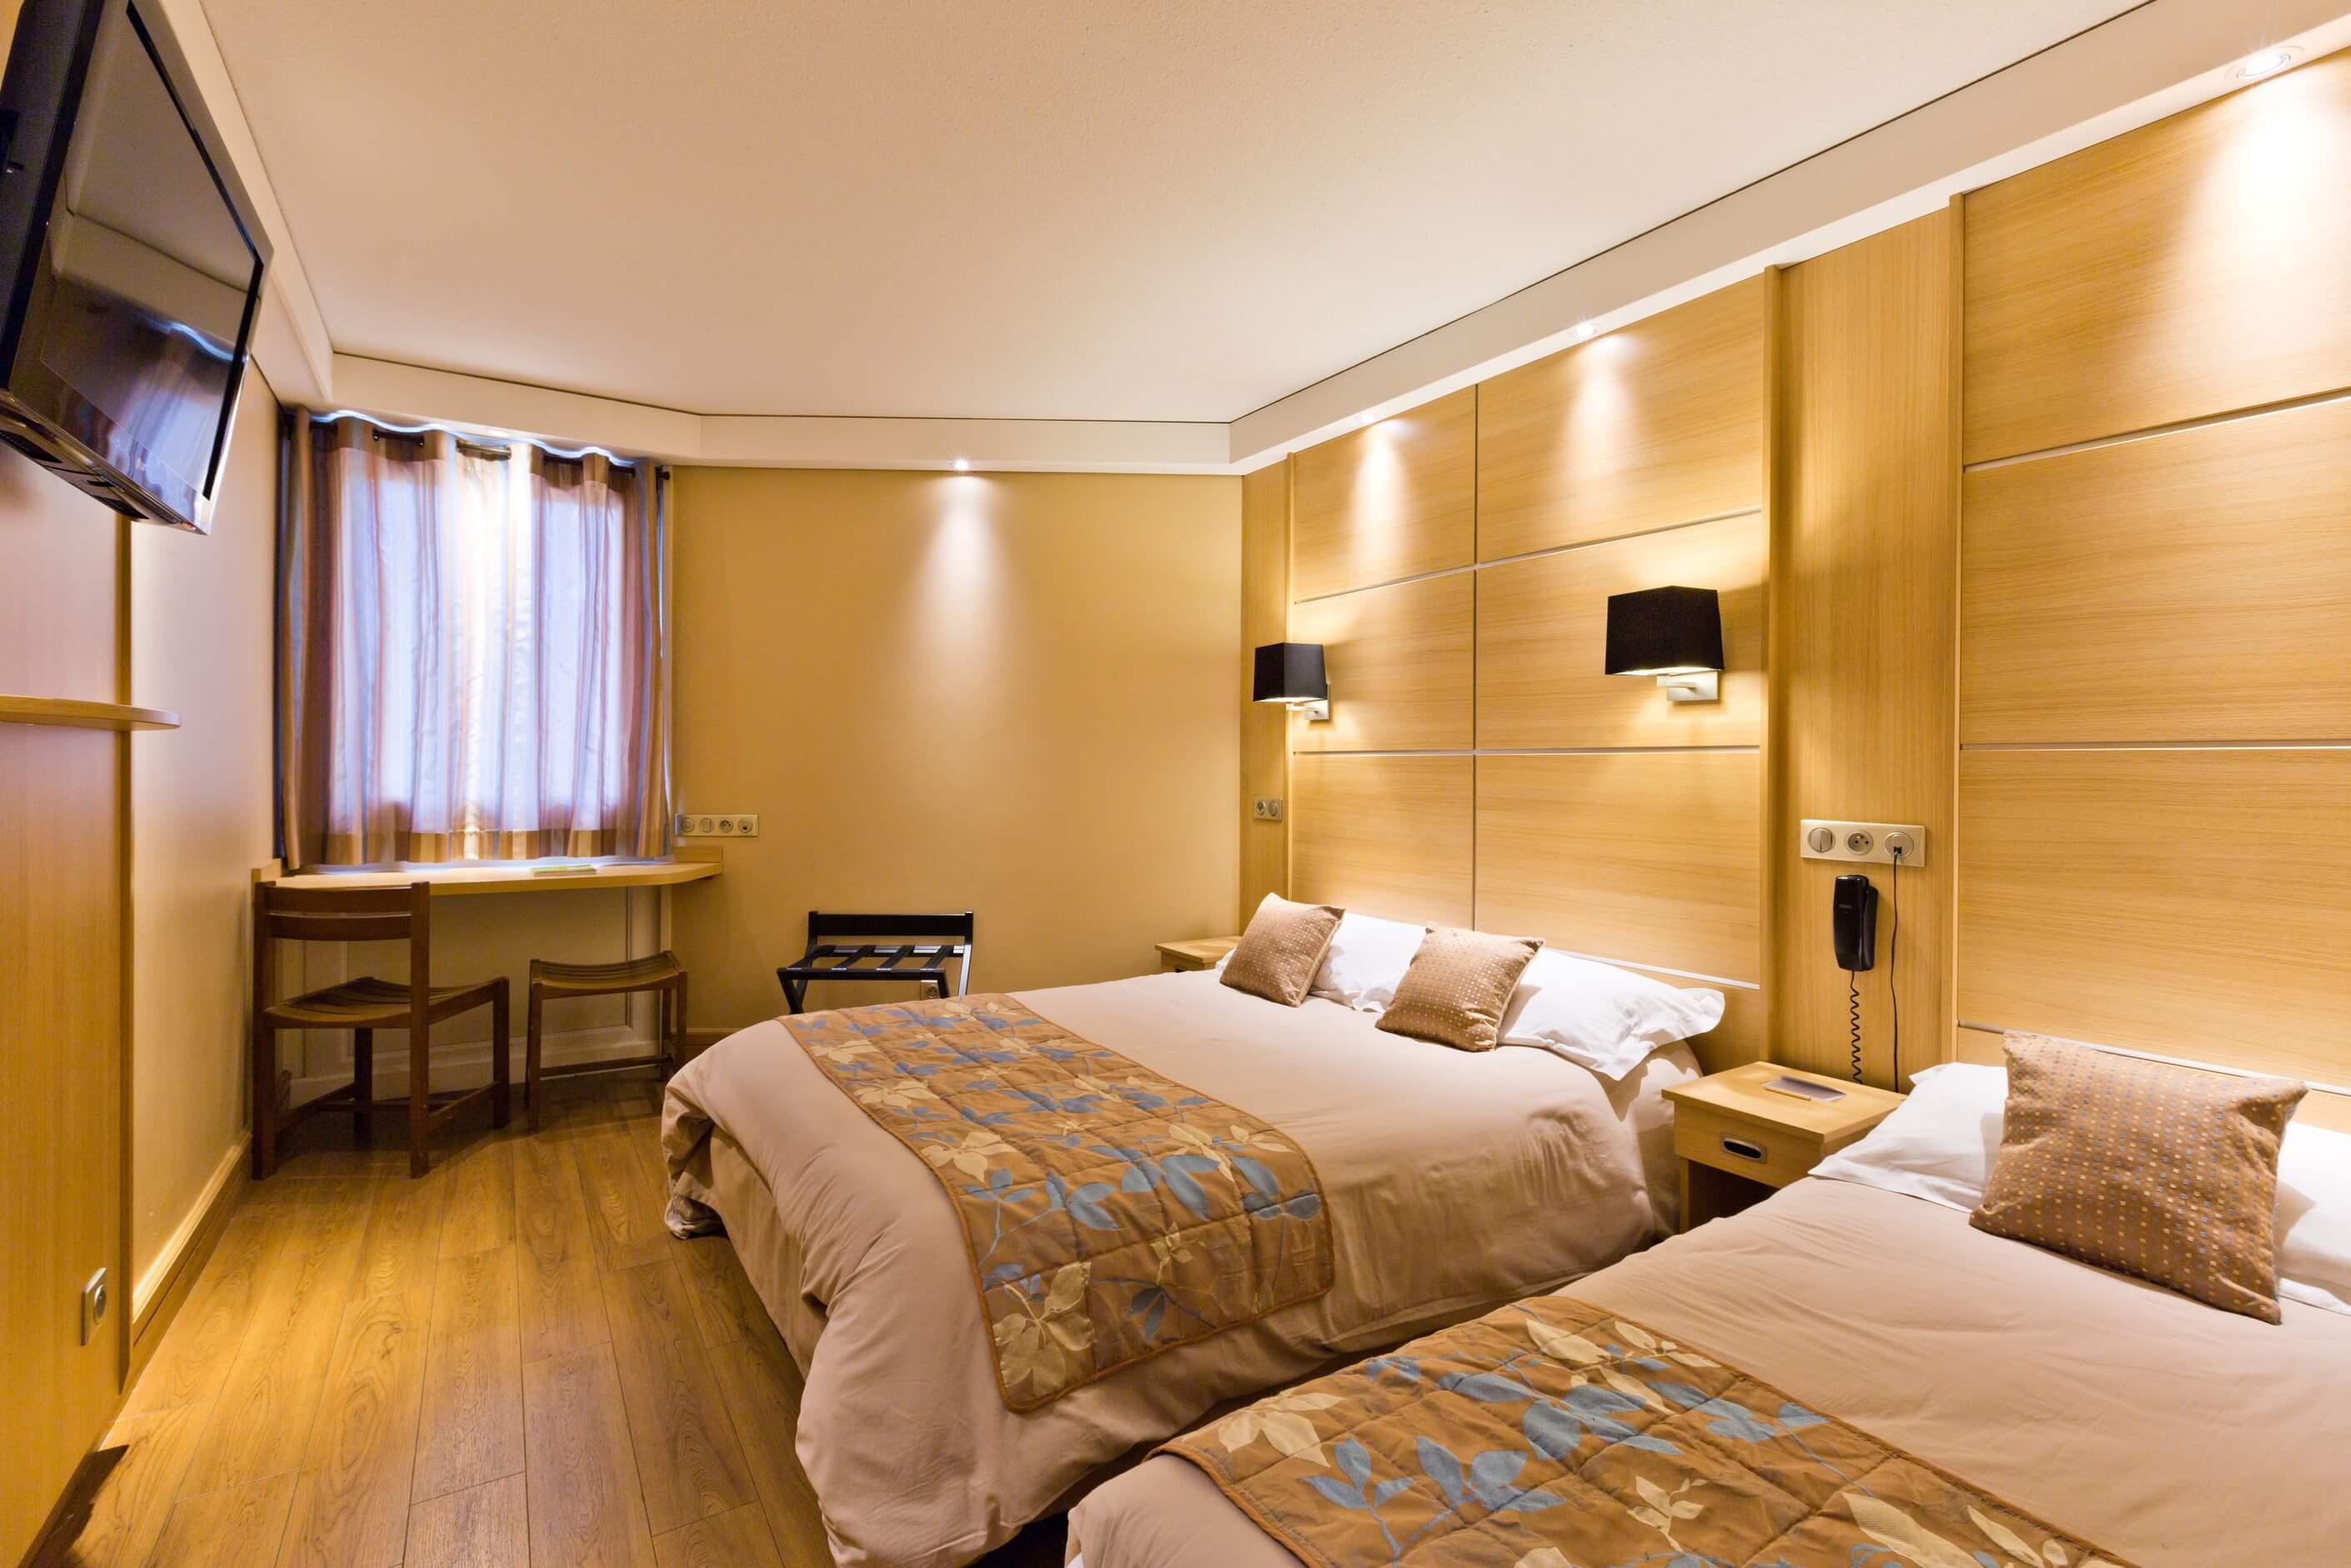 équipement des chambres familiales de l'hôtel Novel